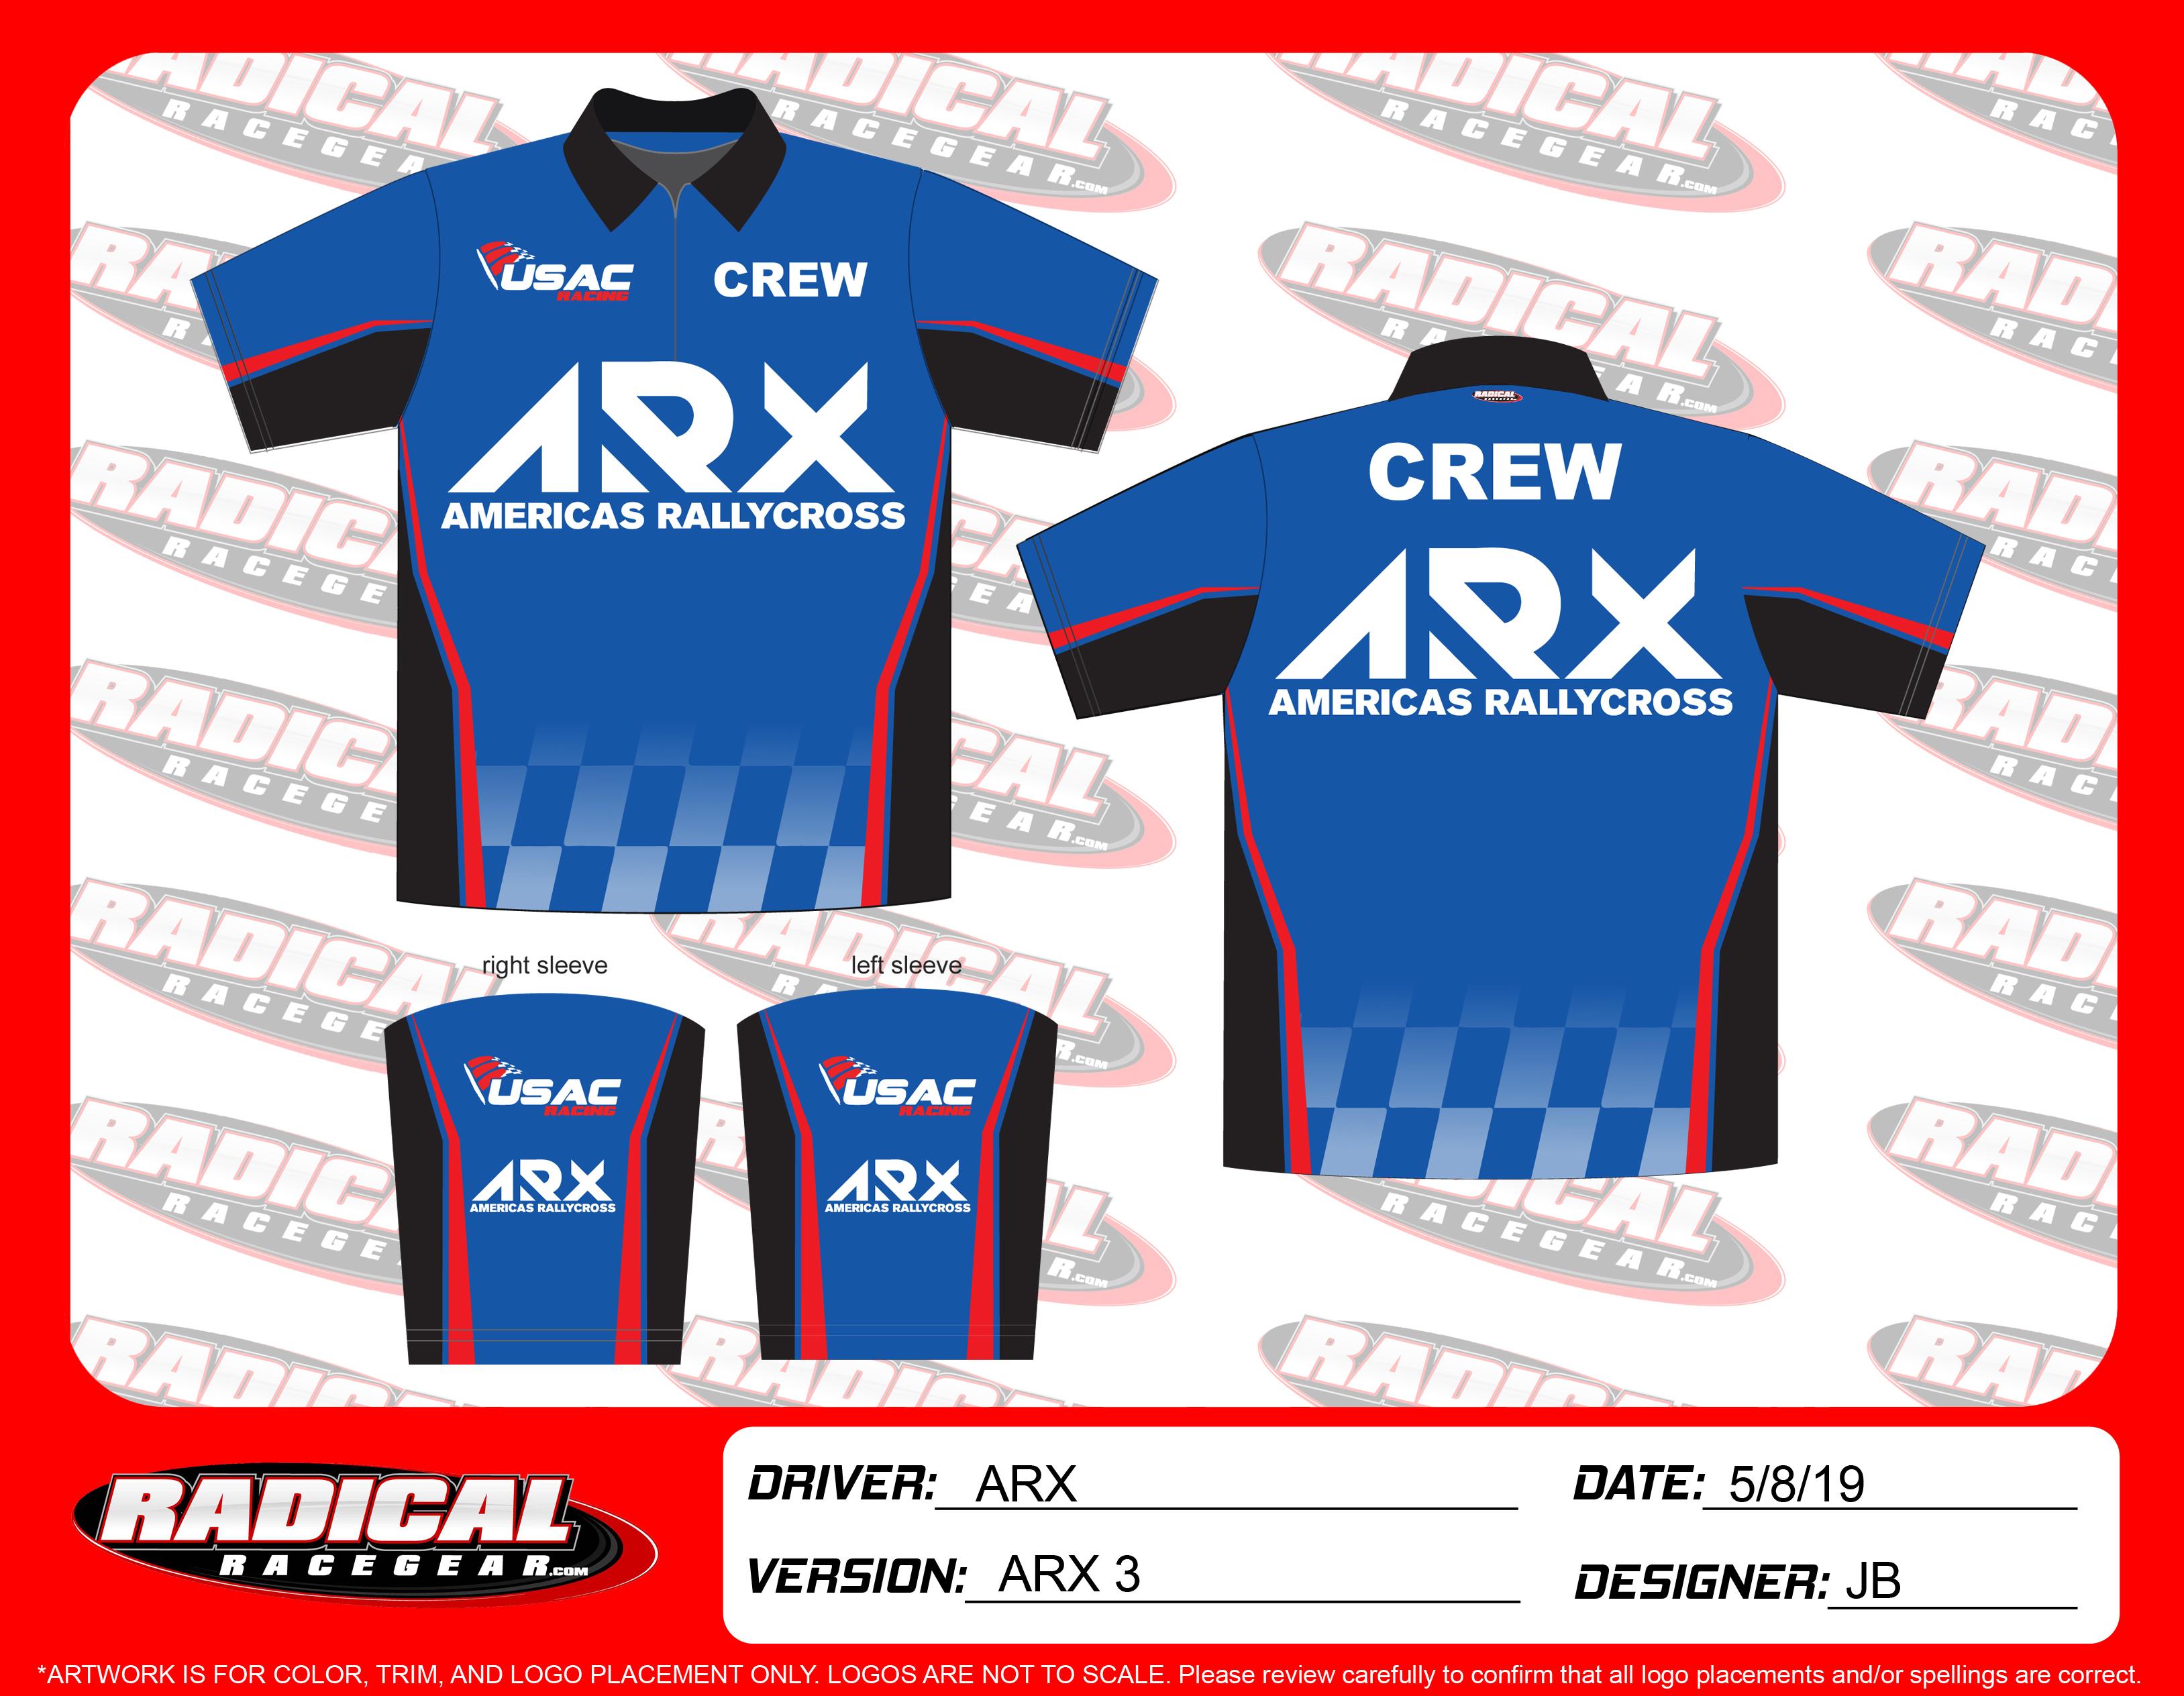 ARX 3